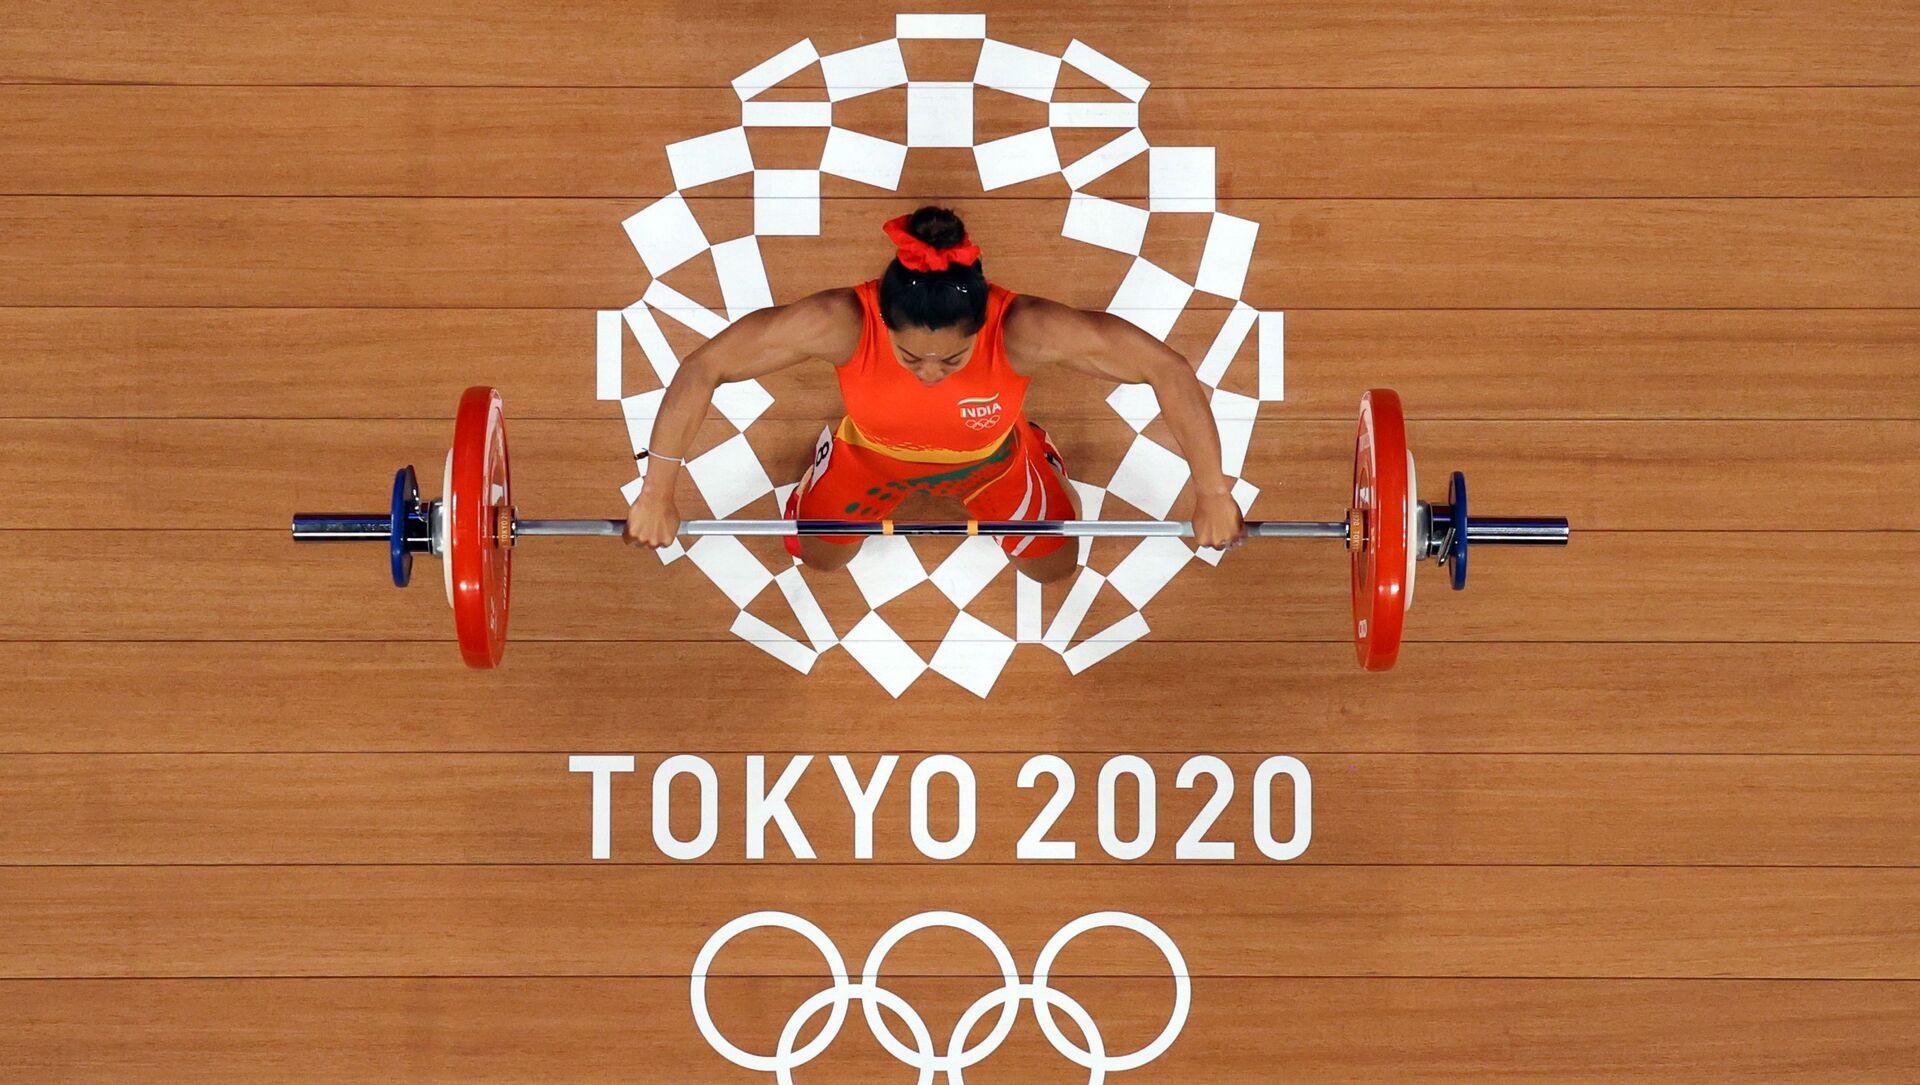 Tokyo 2020 Olympics - Weightlifting - Women's 49kg - Group A - Tokyo International Forum, Tokyo, Japan - July 24, 2021.  Mirabai Chanu Saikhom of India in action. Pool via REUTERS/Chris Graythen - Sputnik International, 1920, 24.07.2021